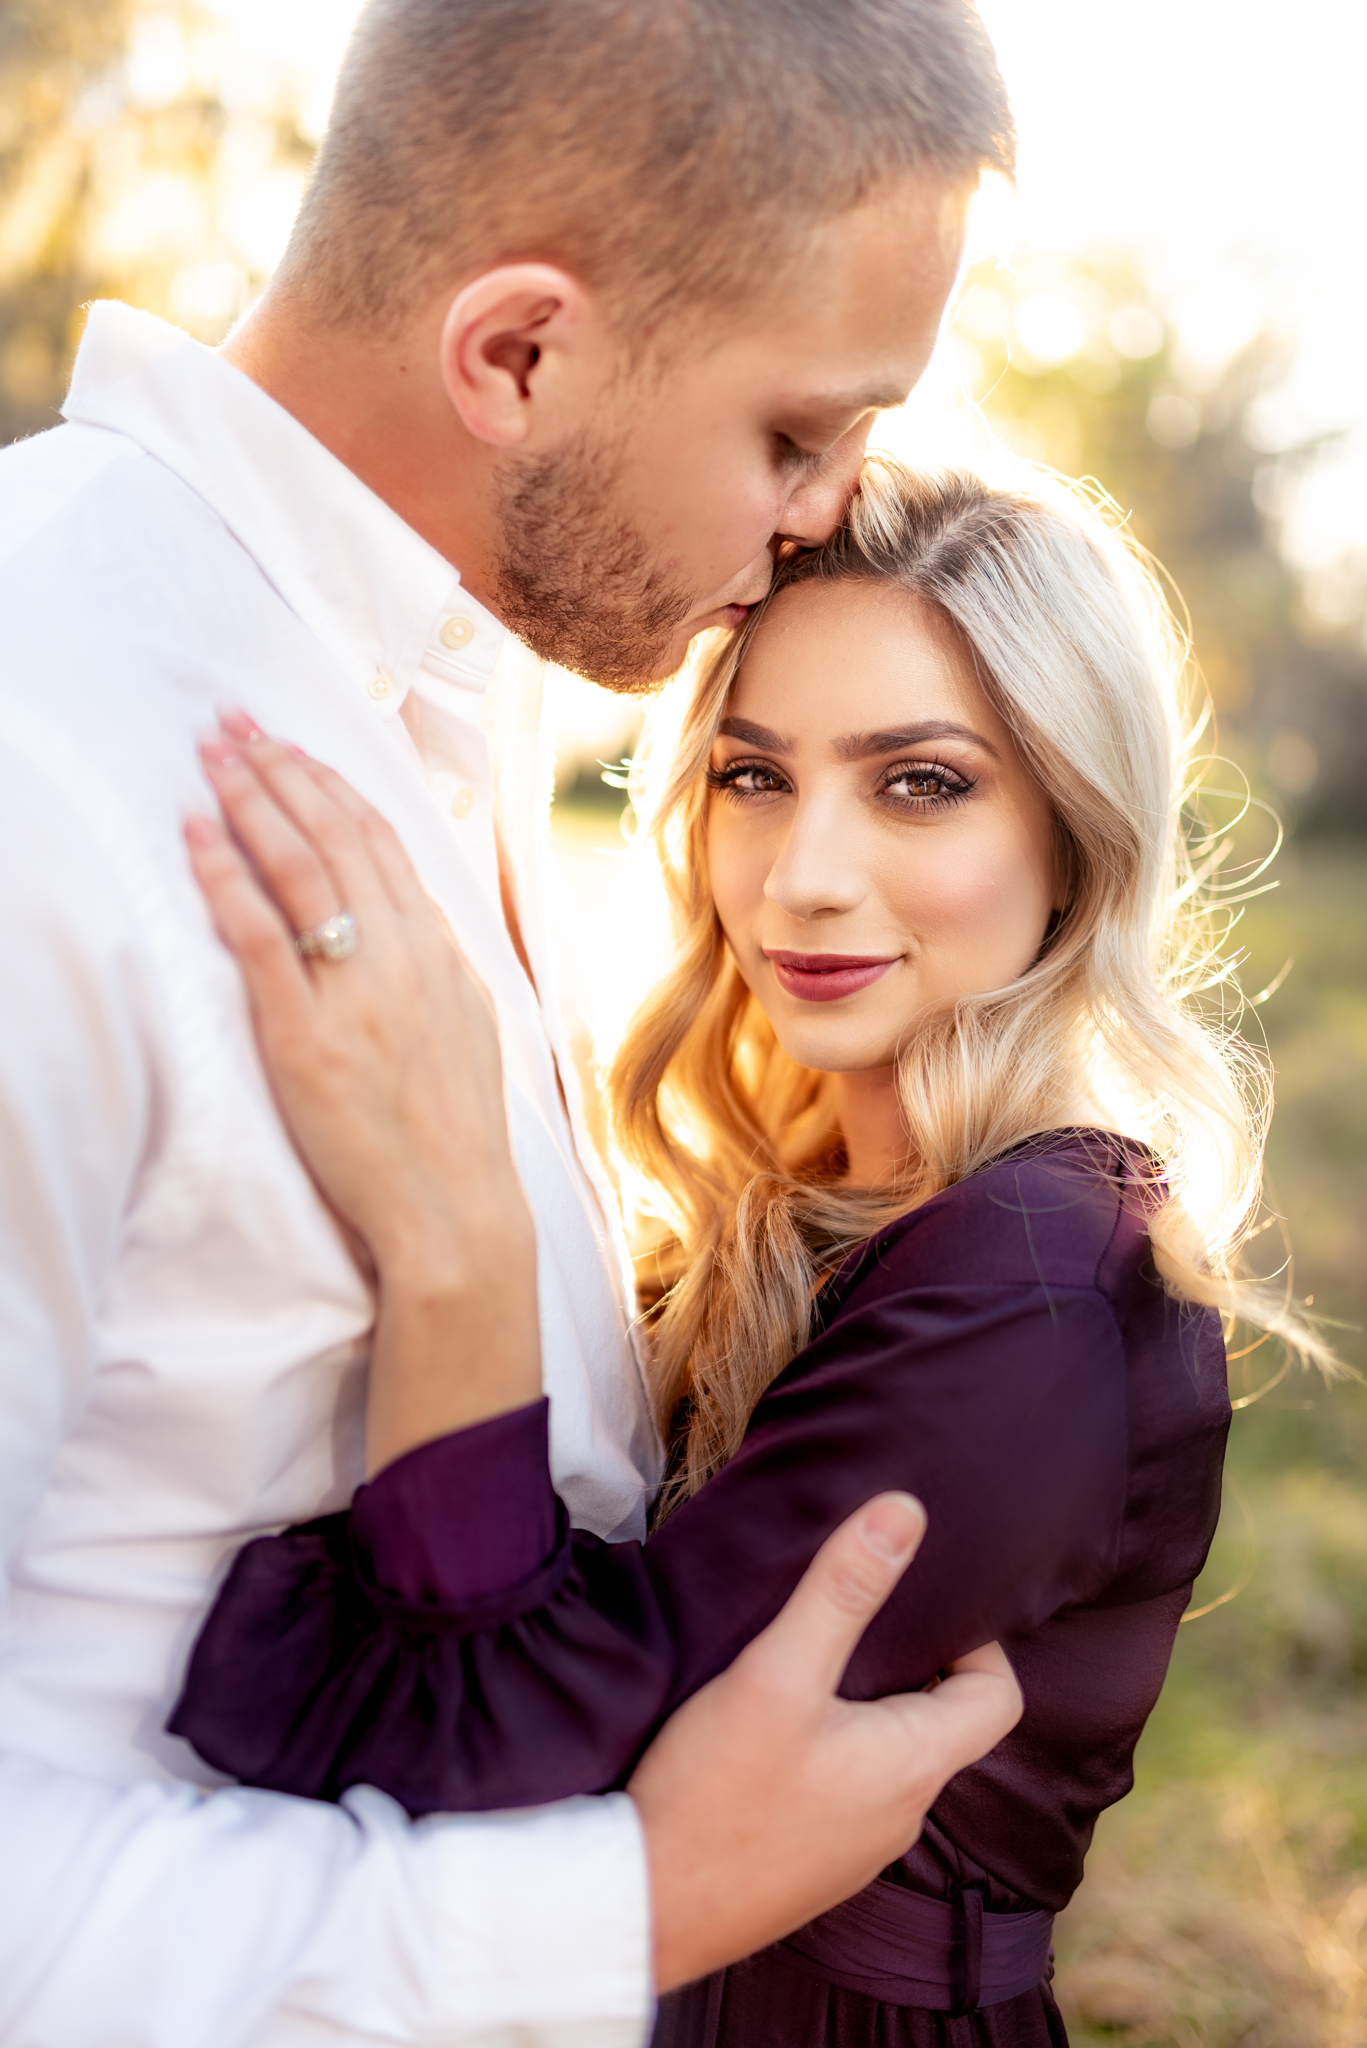 katy-wedding-photographer-houston-wedding-photographer-bride-sugar-land-cypress-richmond-spring-25.jpg